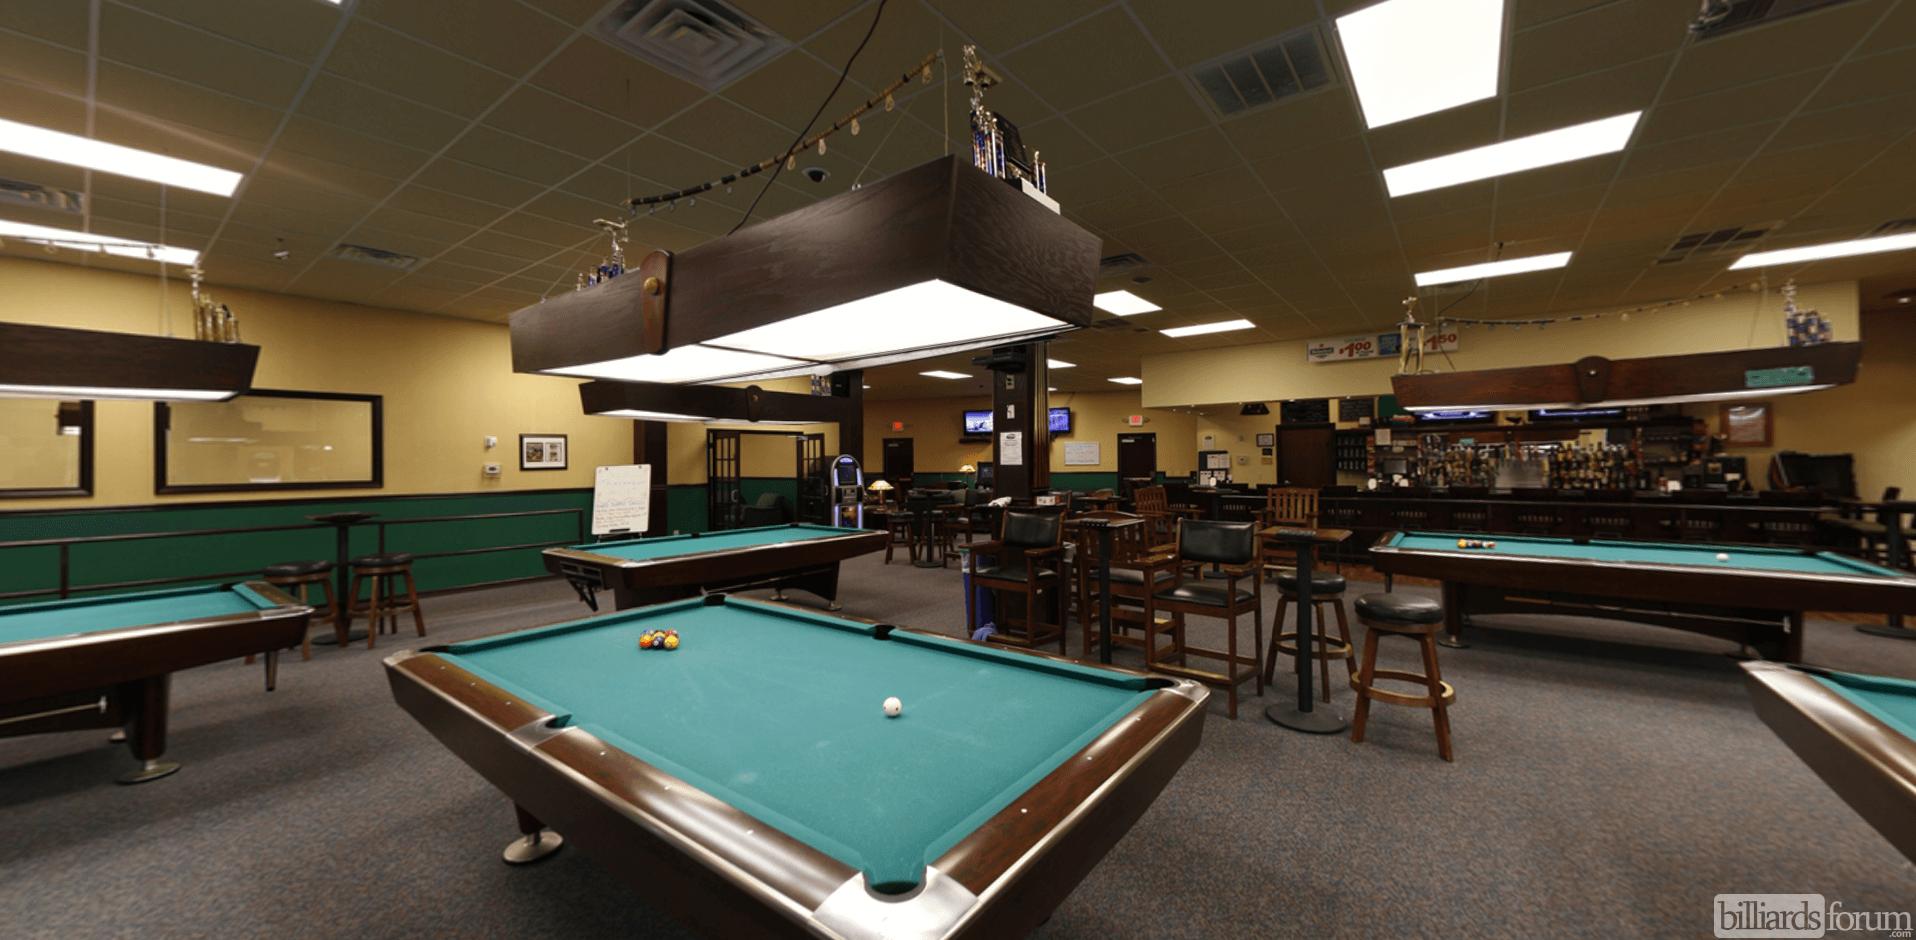 High Quality Pool Tables At Gate City Billiards Club Greensboro, NC